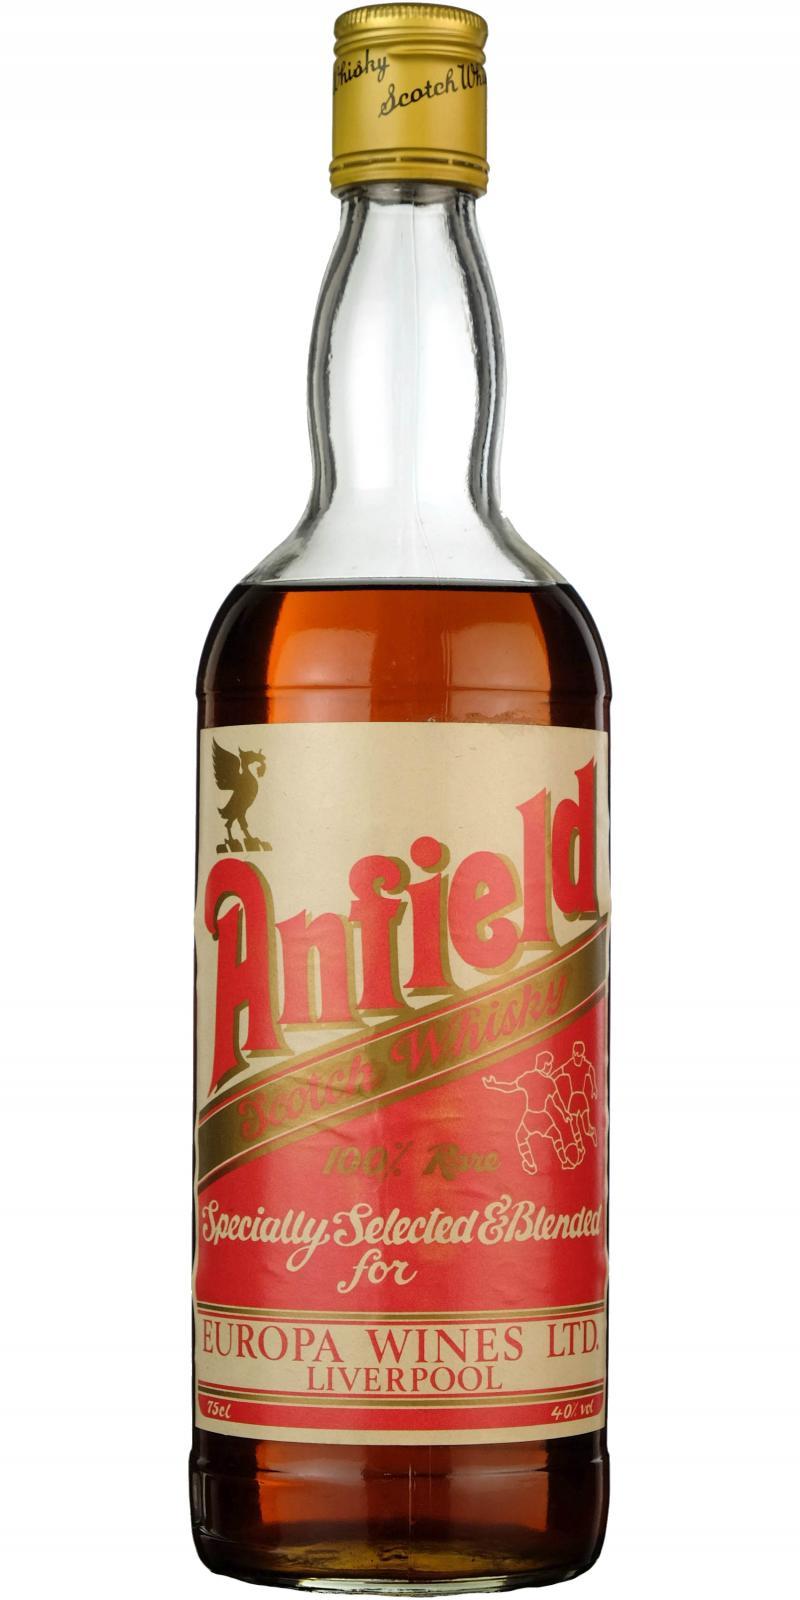 Anfield 100% Rare